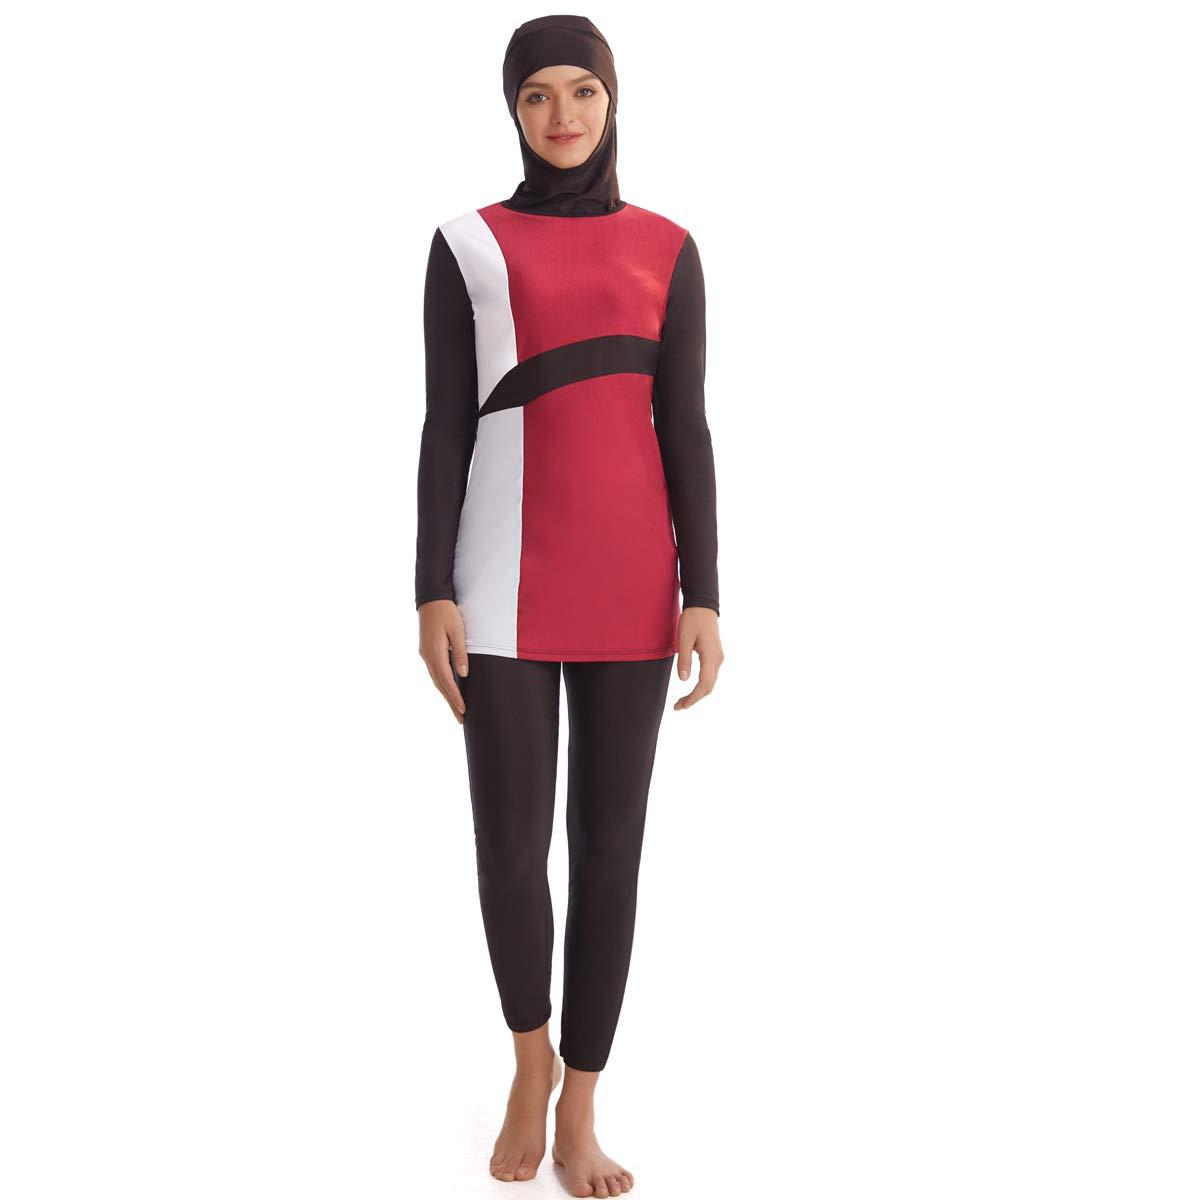 Costume da Bagno Islamico Burkini Musulmana Modesty con Hijab seafanny